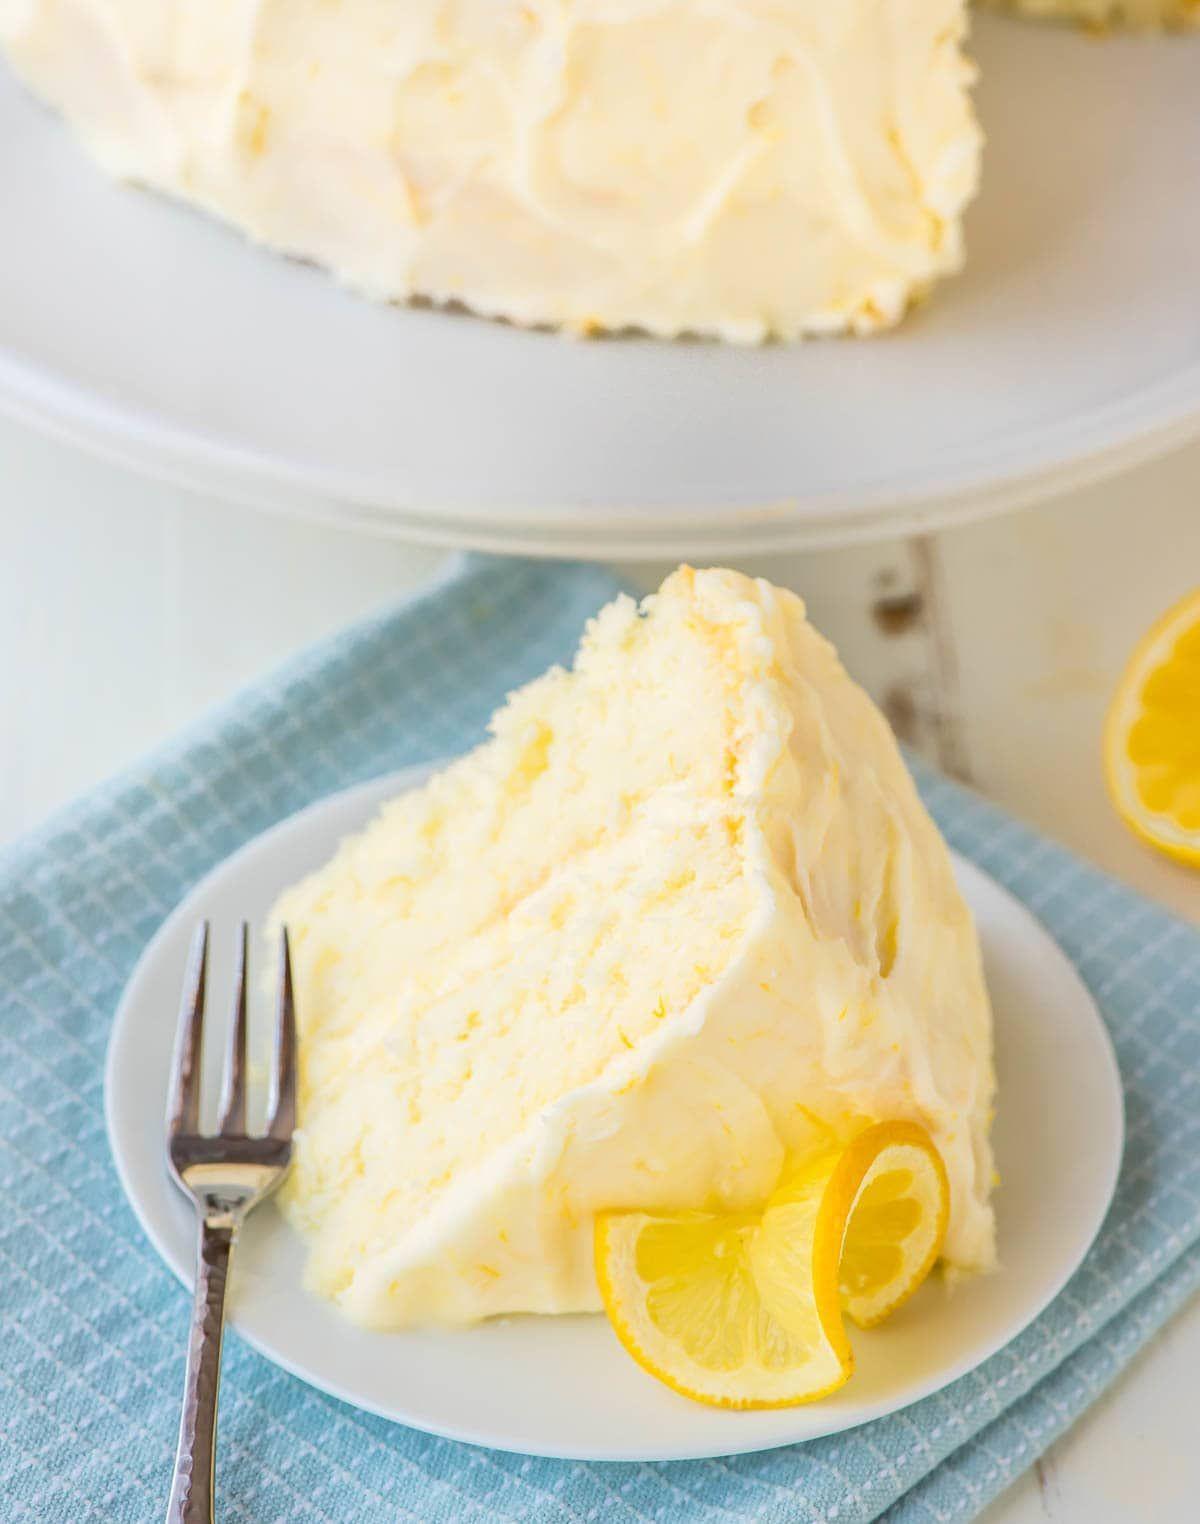 This Lemon Cake Recipe tastes like sunshine on a plate! Moist, fluffy and bursting with bright lemon flavor. Slathered in Lemon Cream Cheese Frosting and so dang good! @wellplated Lemon Cake Recipe tastes like sunshine on a plate! Moist, fluffy and bursting with bright lemon flavor. Slathered in Lemon Cream Cheese Frosting and so dang good! @wellplated